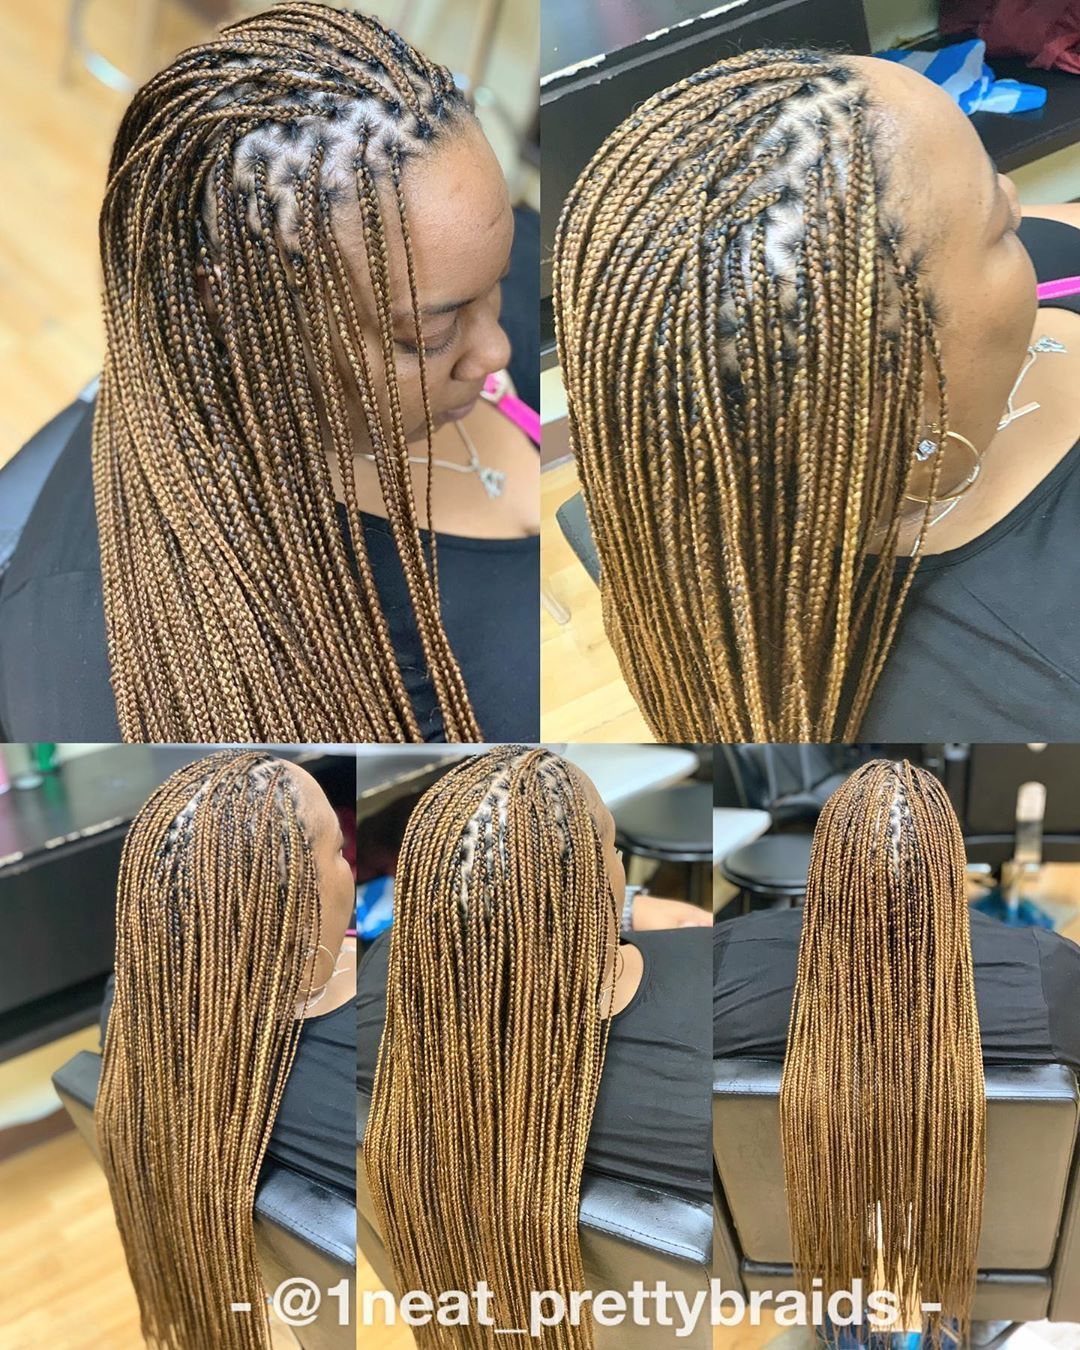 24+ Mid back length knotless braids ideas